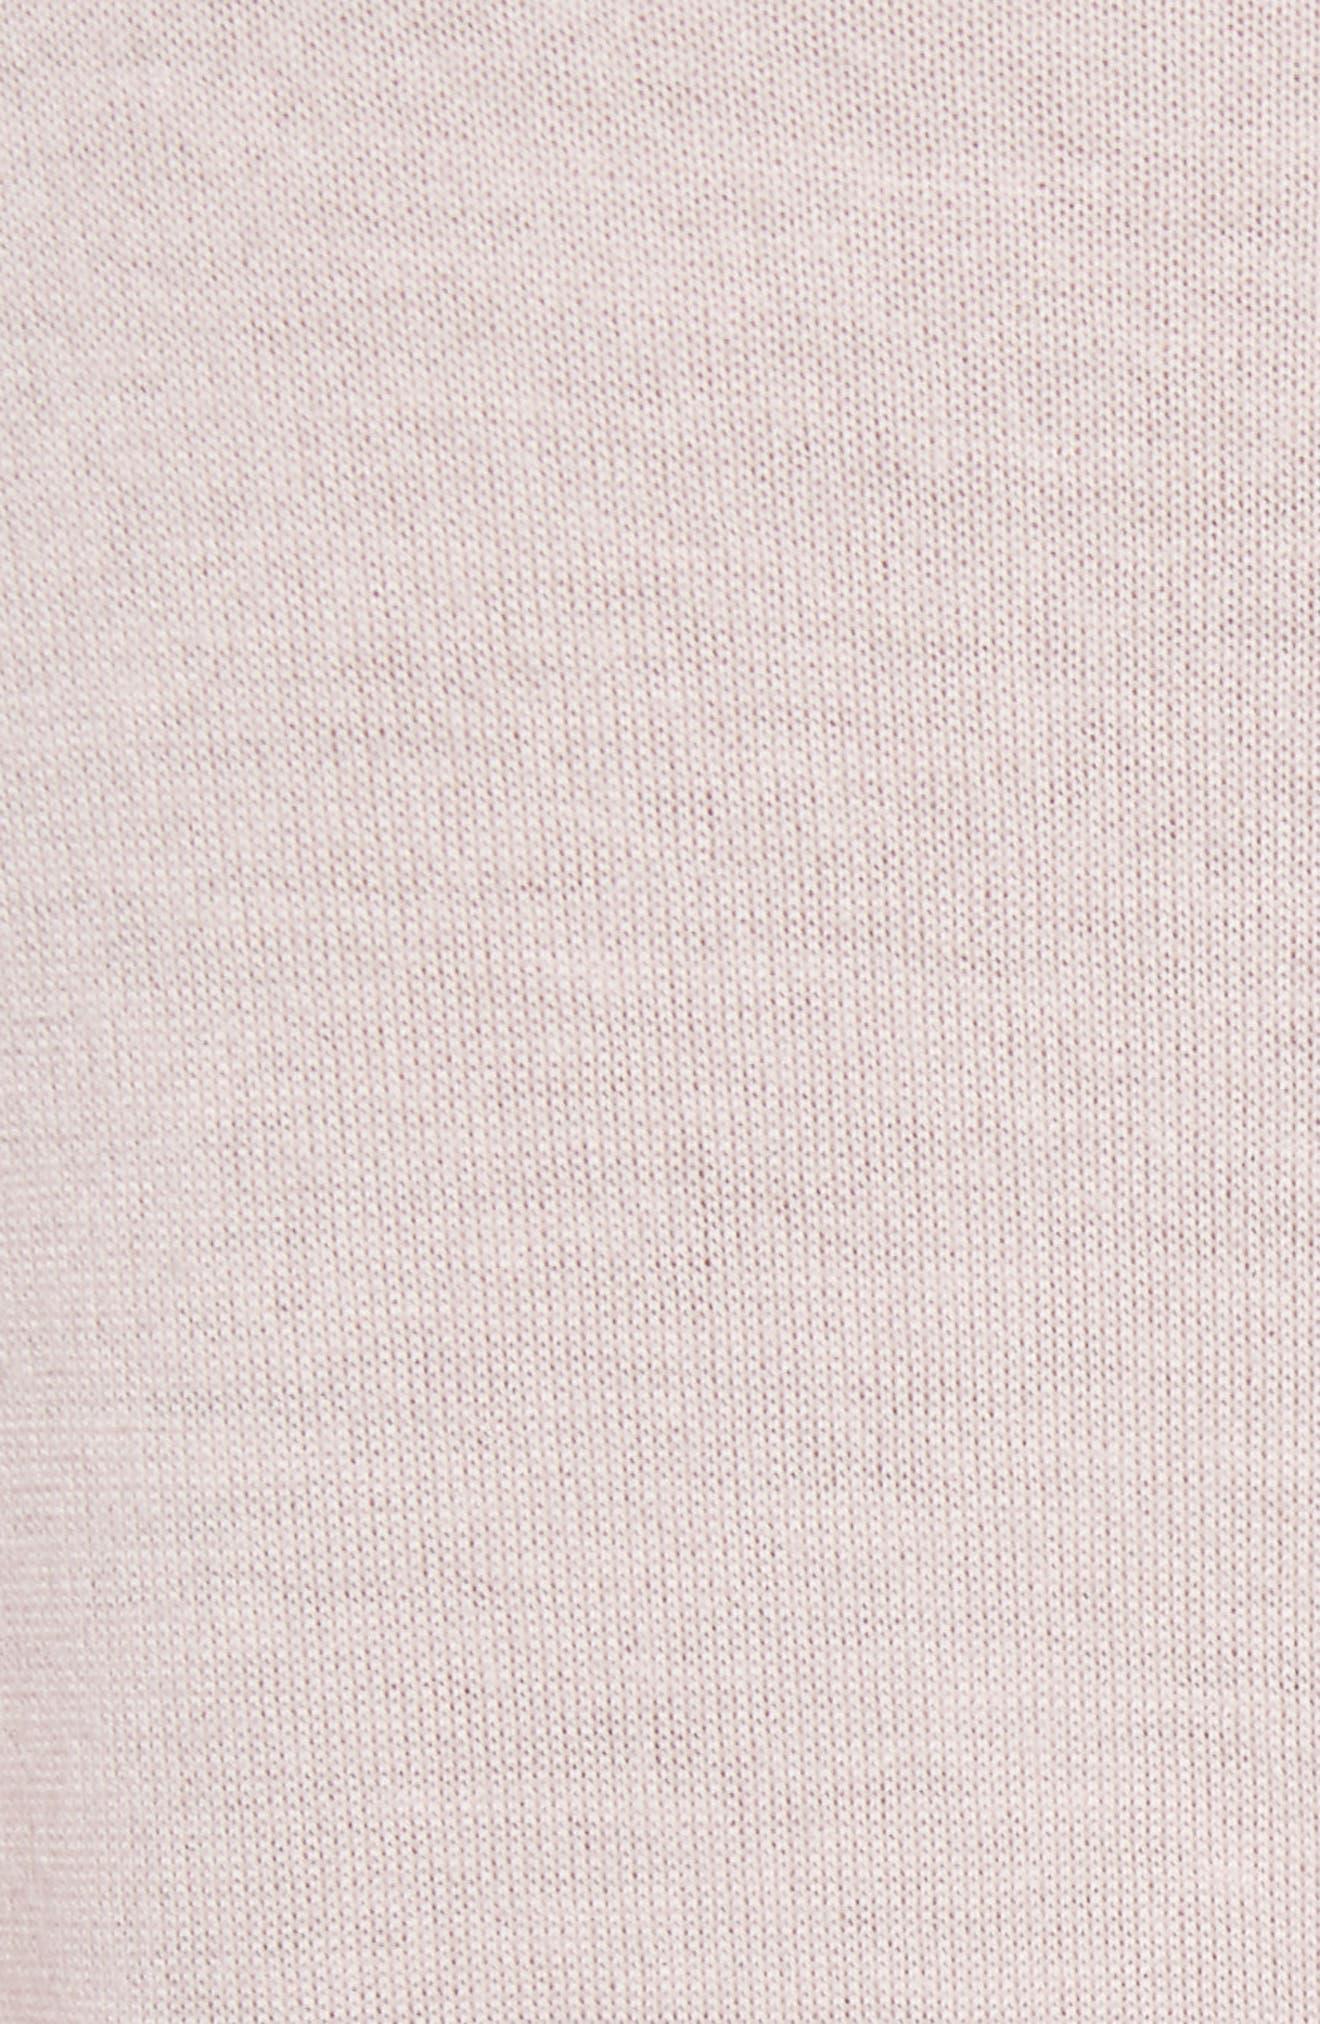 True Crewneck Wool Sweater,                             Alternate thumbnail 5, color,                             650